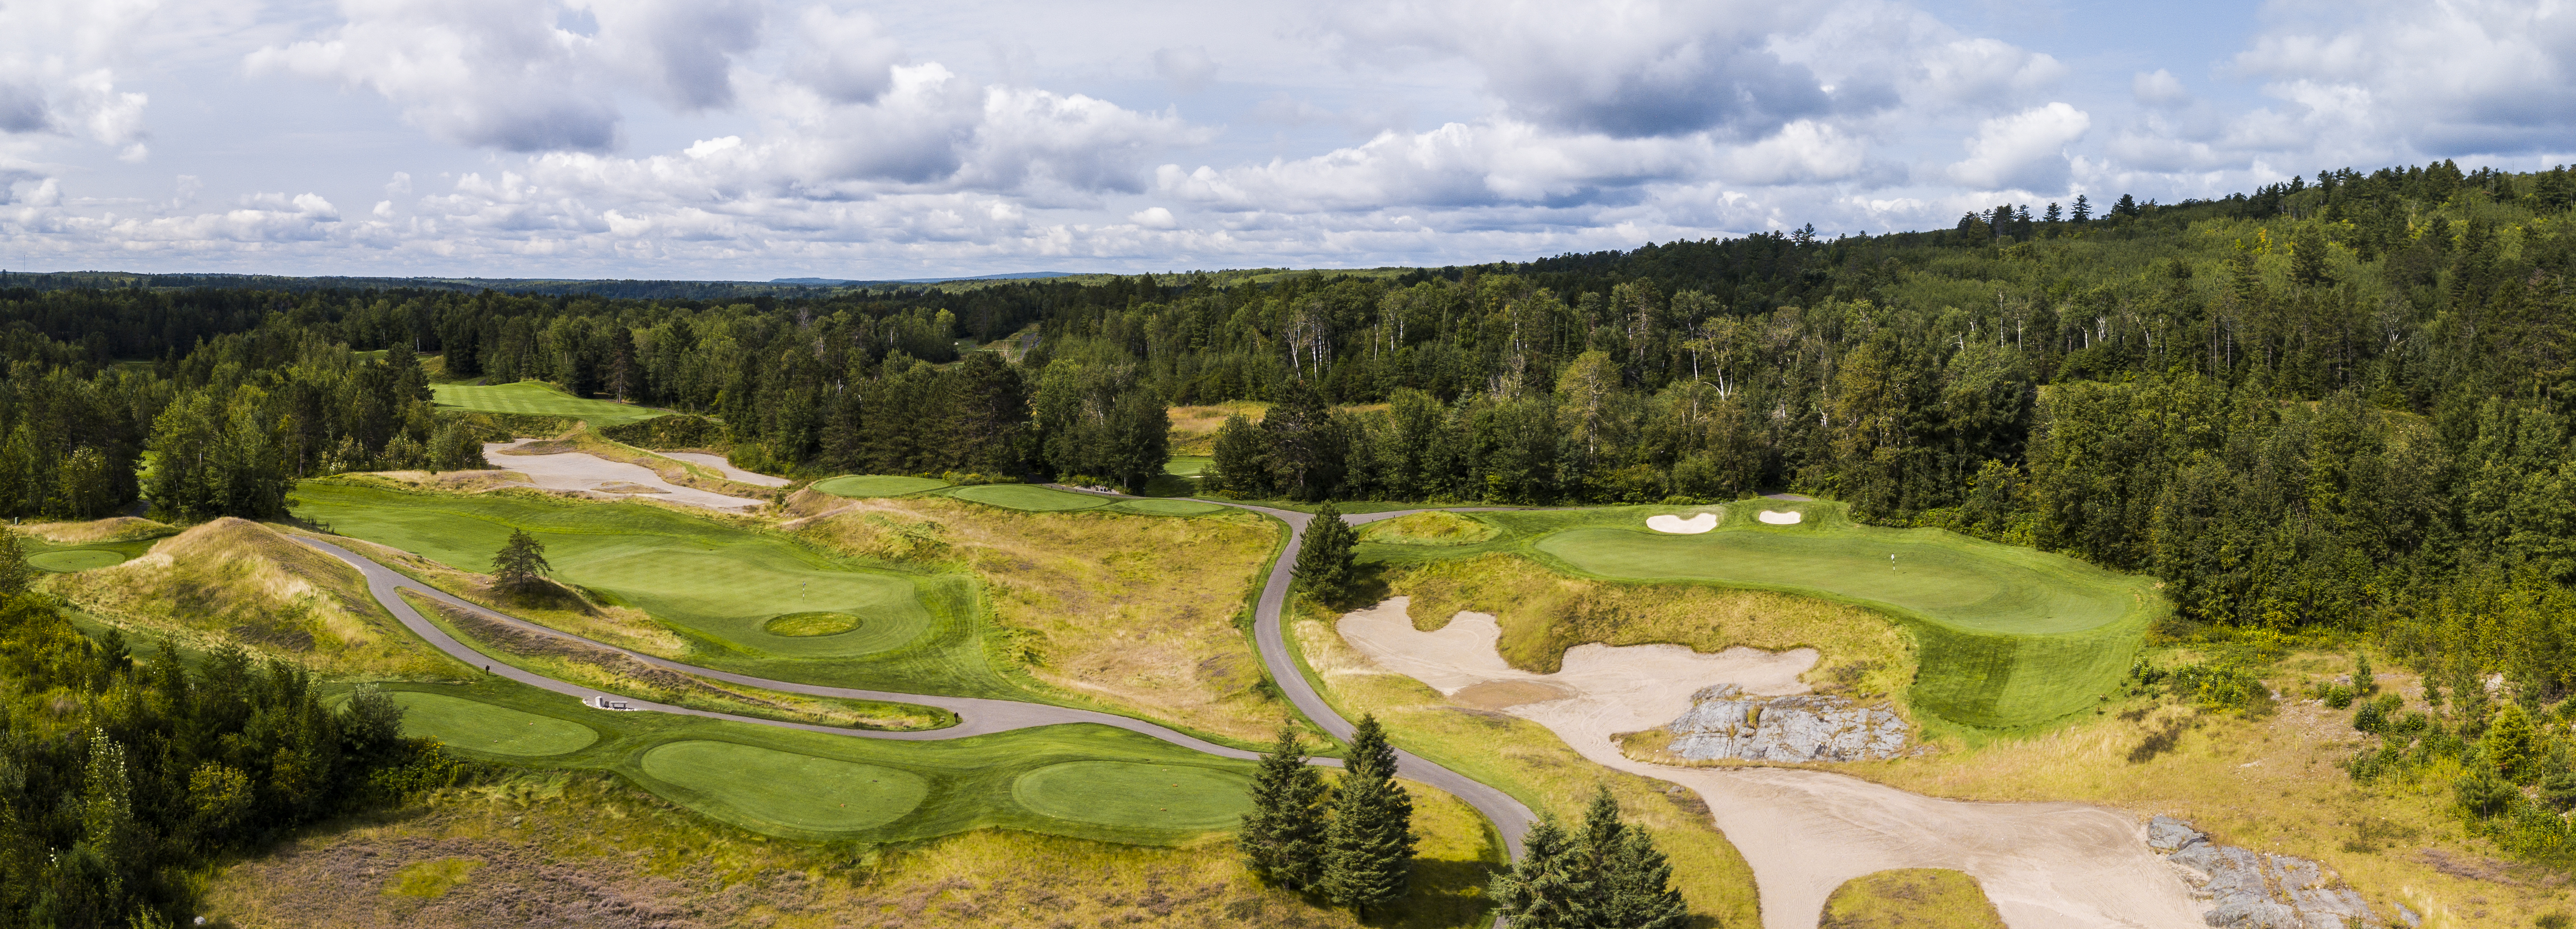 35++ Best golf courses in minnesota 2019 info